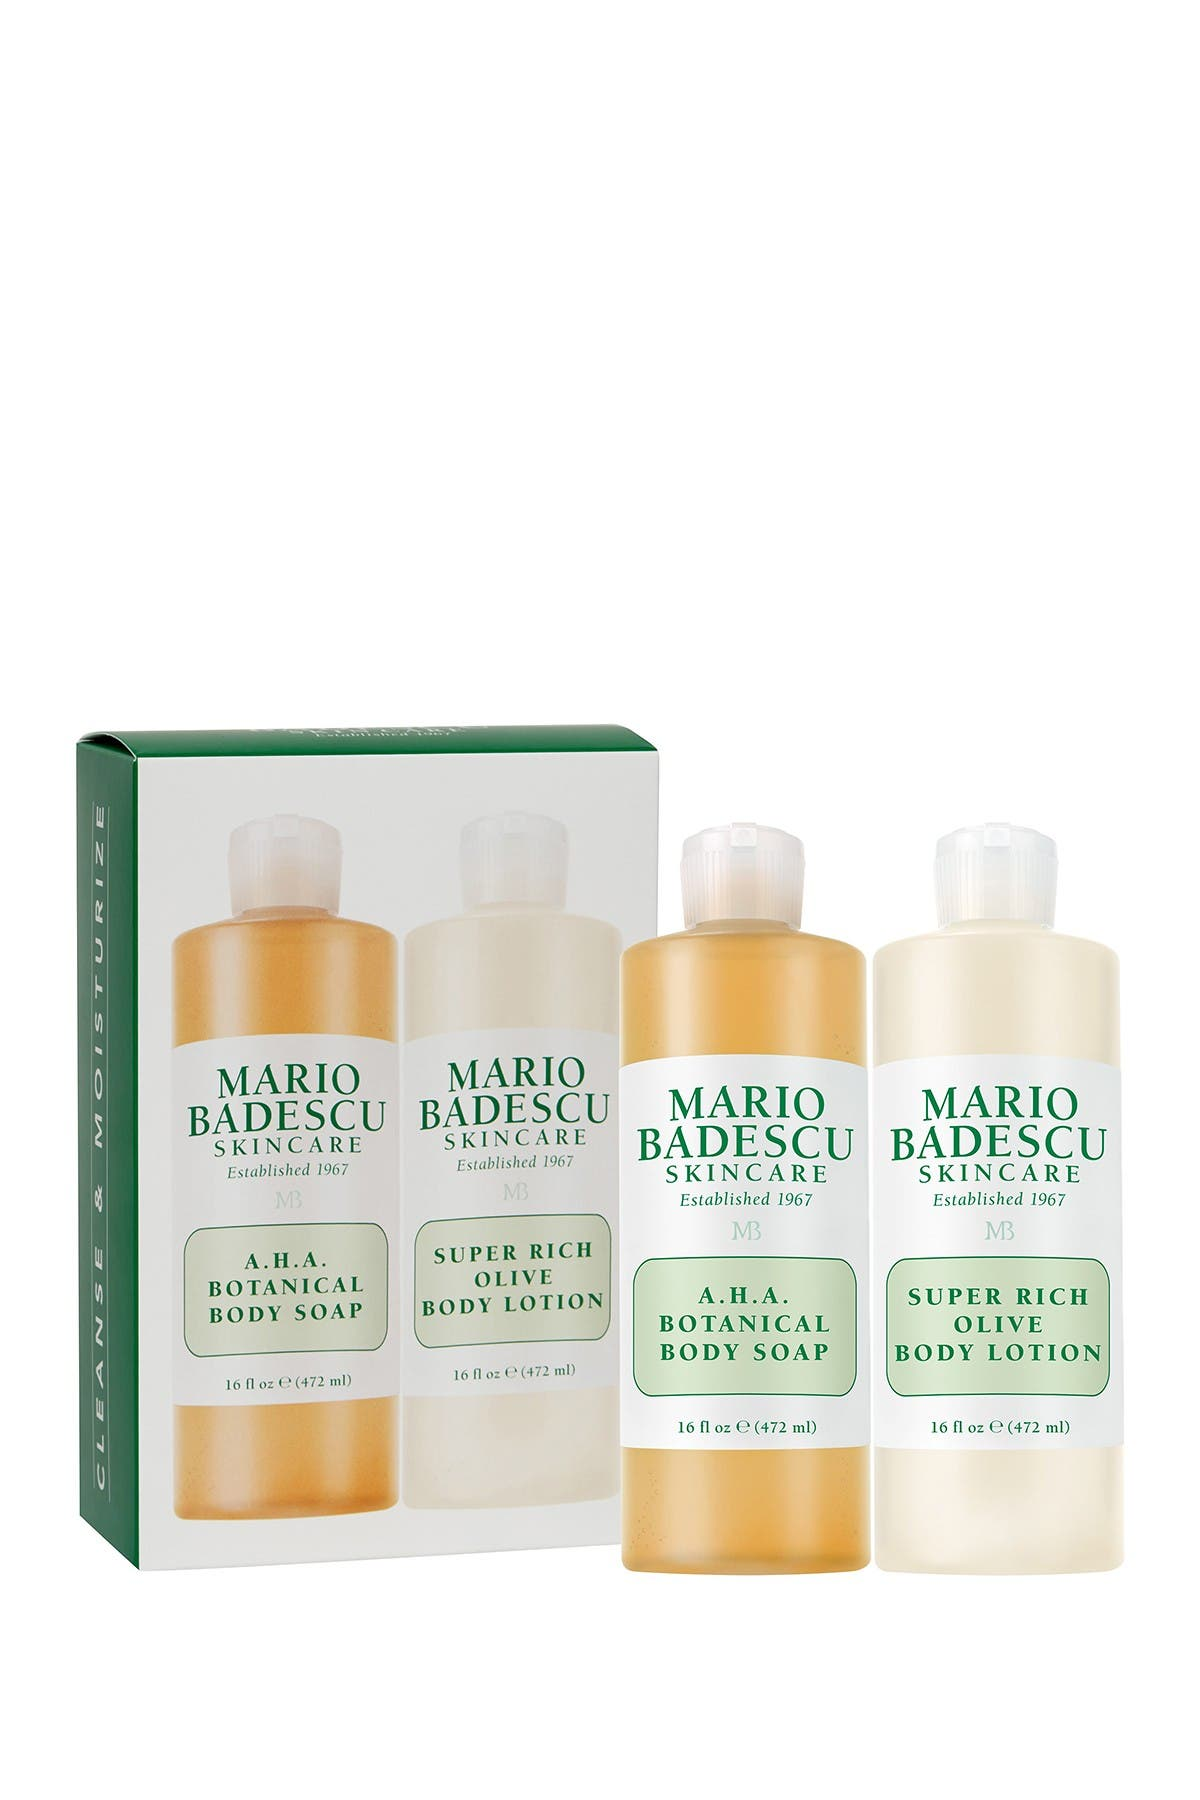 Image of Mario Badescu Jumbo Body Care Kit